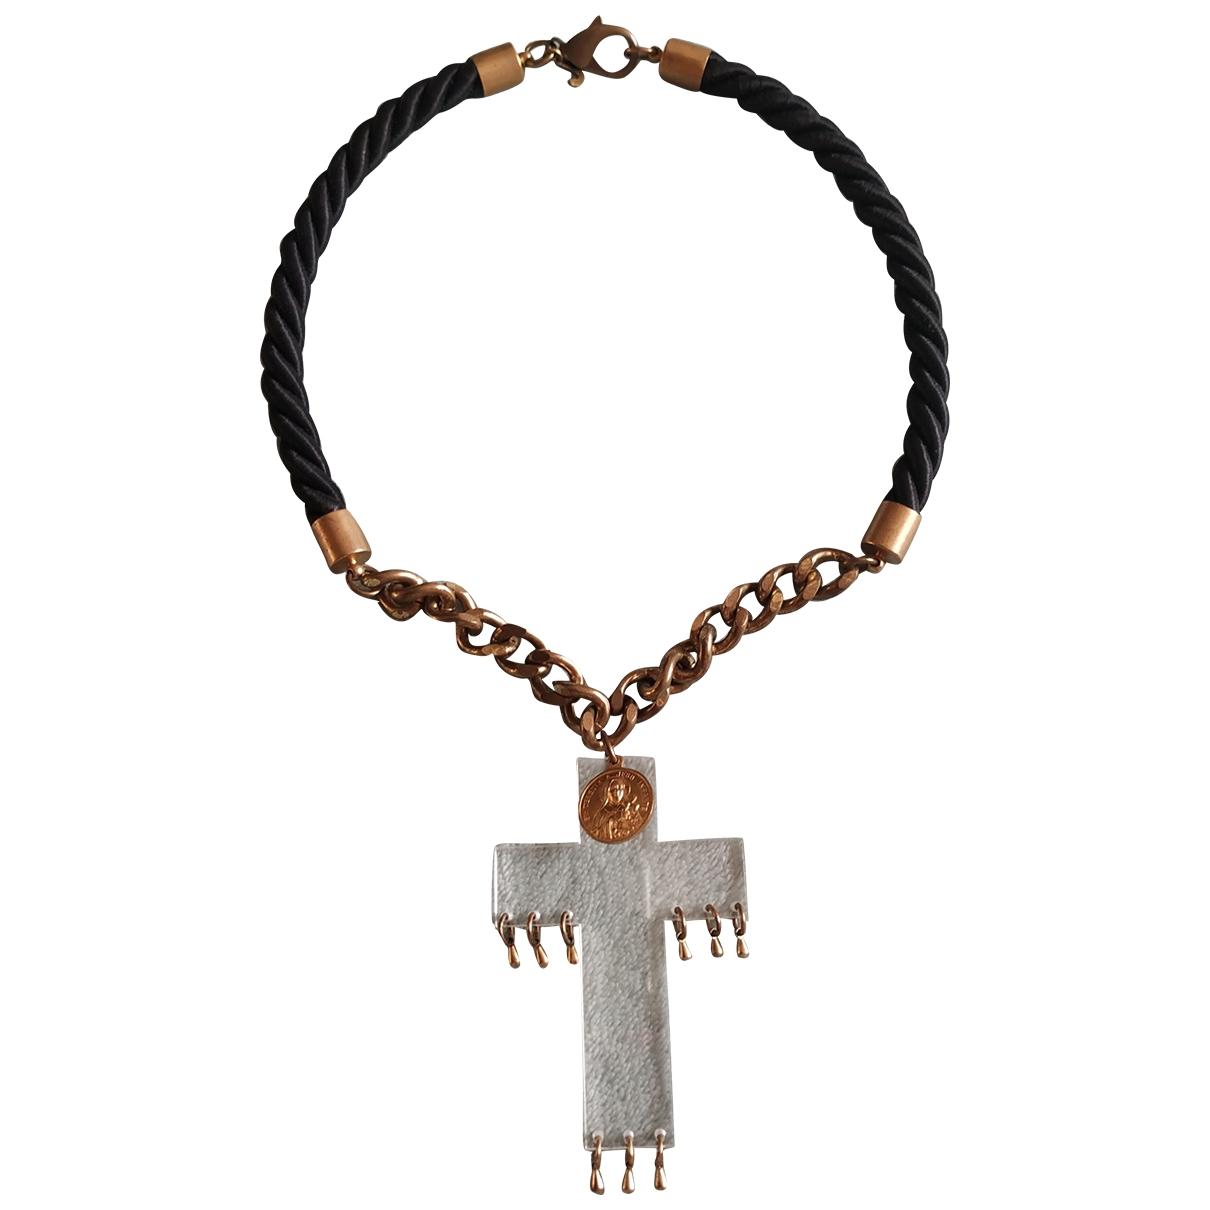 Justine Clenquet \N Black Metal necklace for Women \N